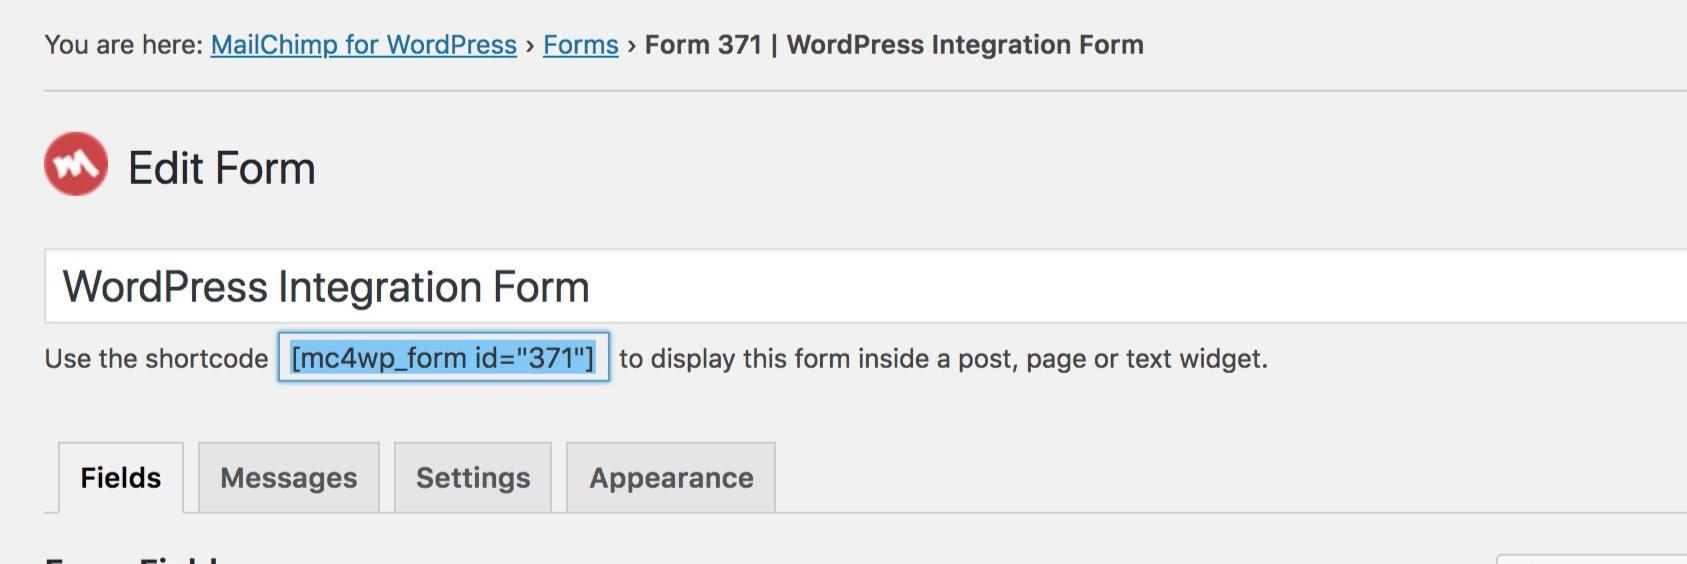 mailchimp-form-shortcode-kadence-themes